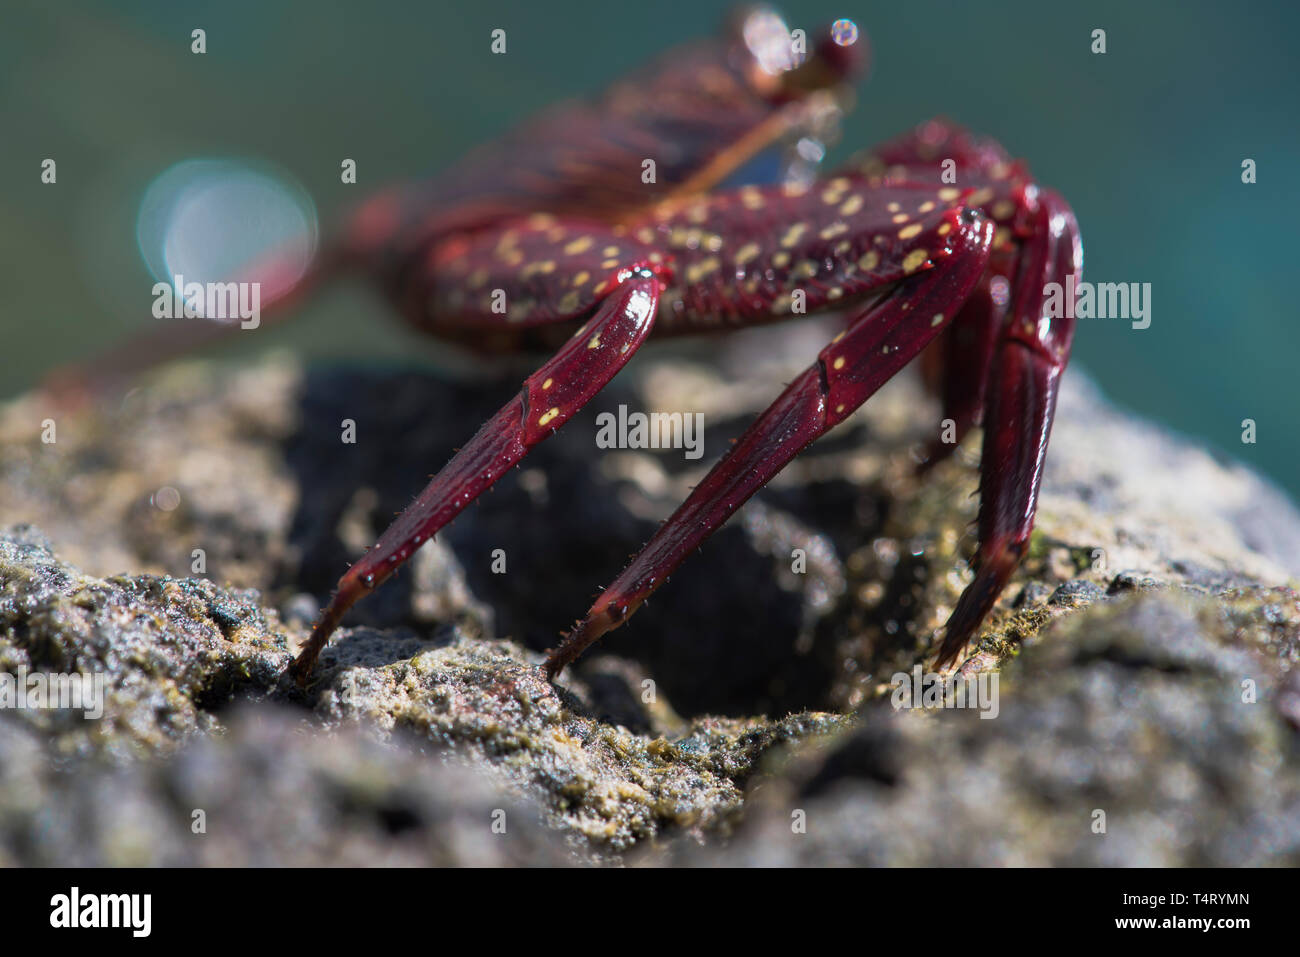 Sally Lightfoot Crab Legs - Stock Image